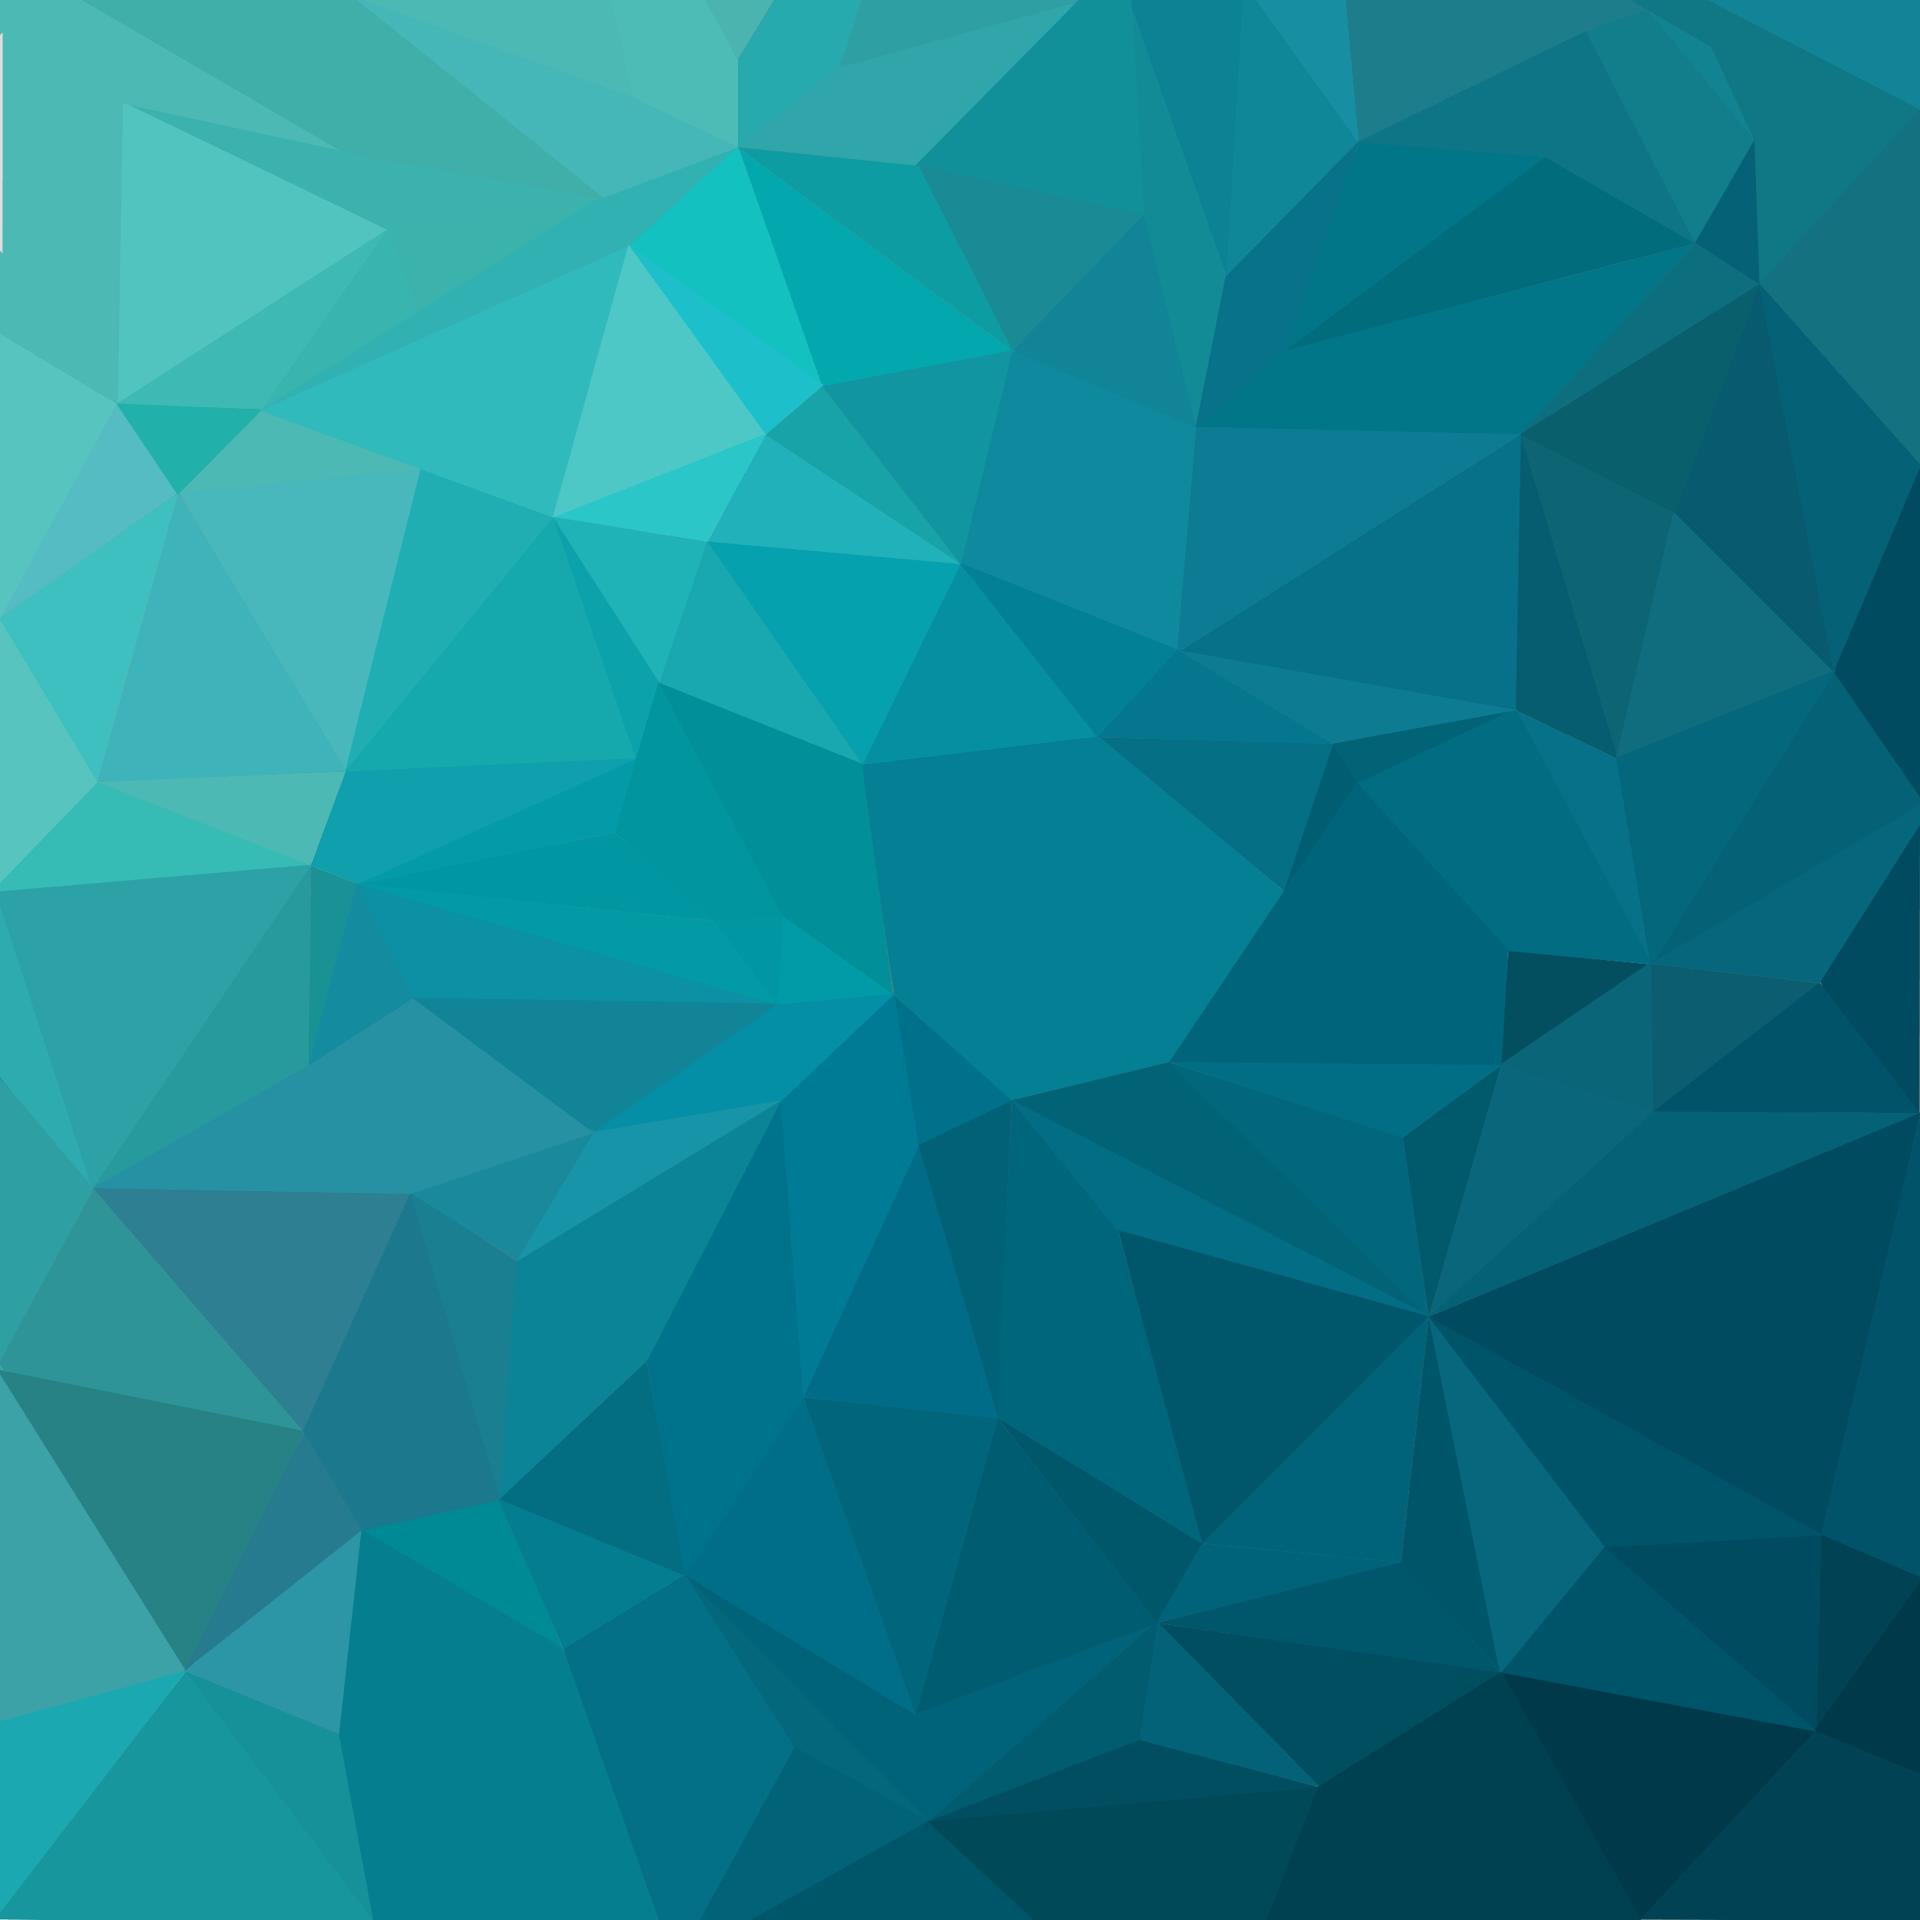 Free S5 Wallpaper